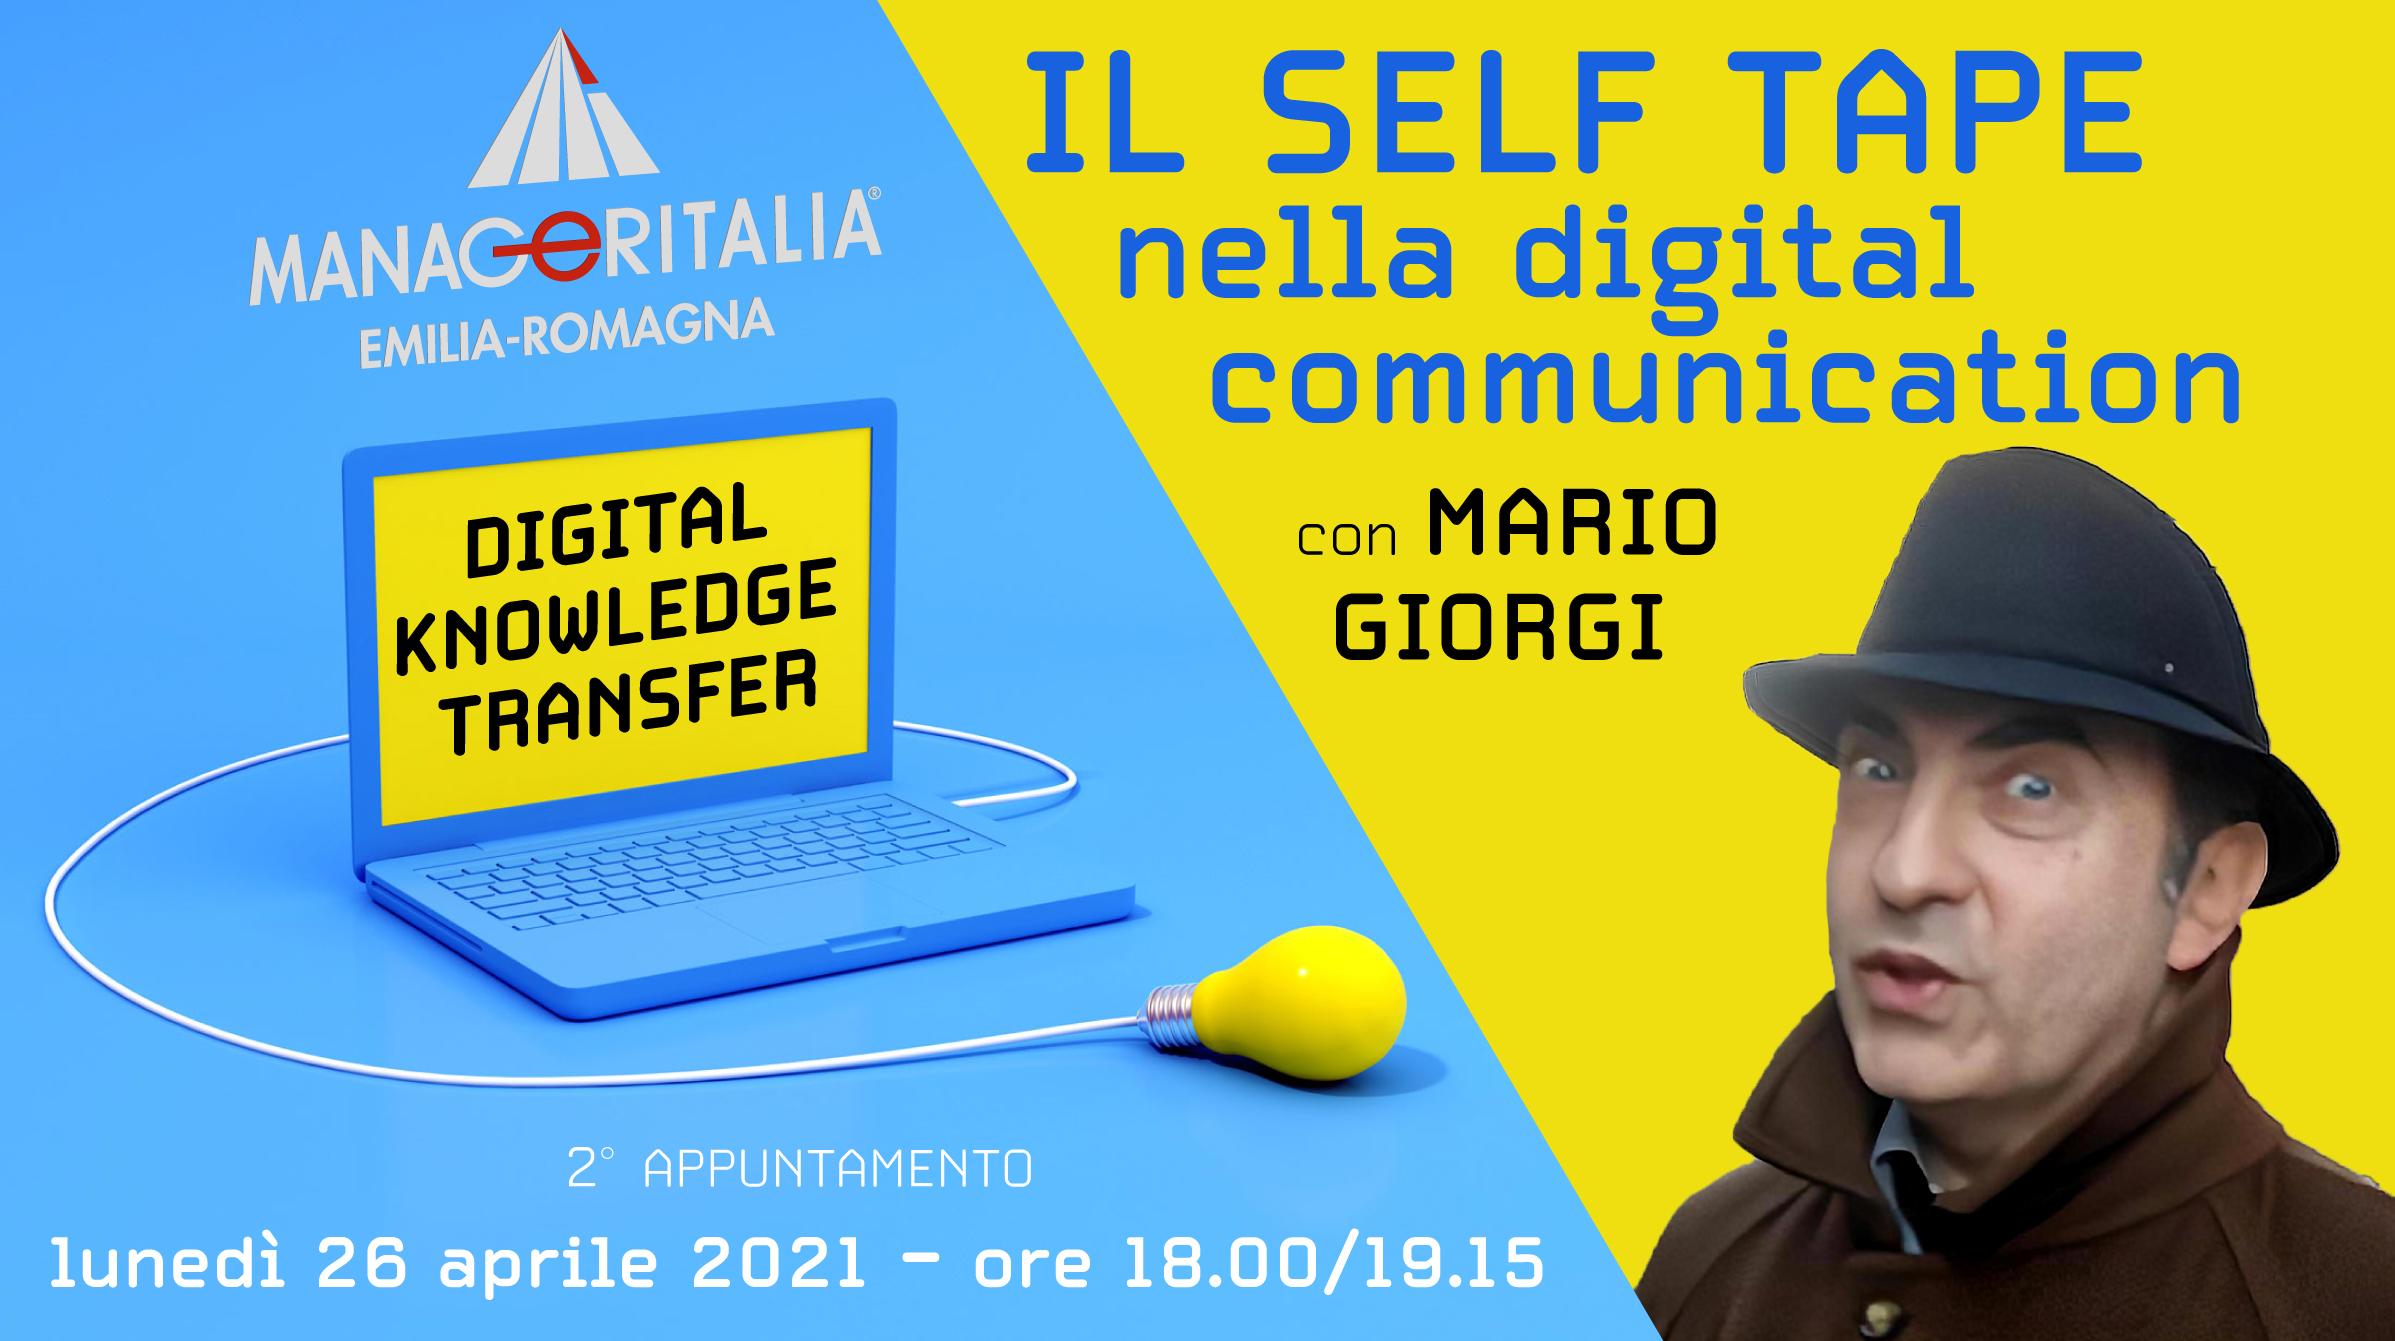 Self Tape nella digital communication – Manager Italia